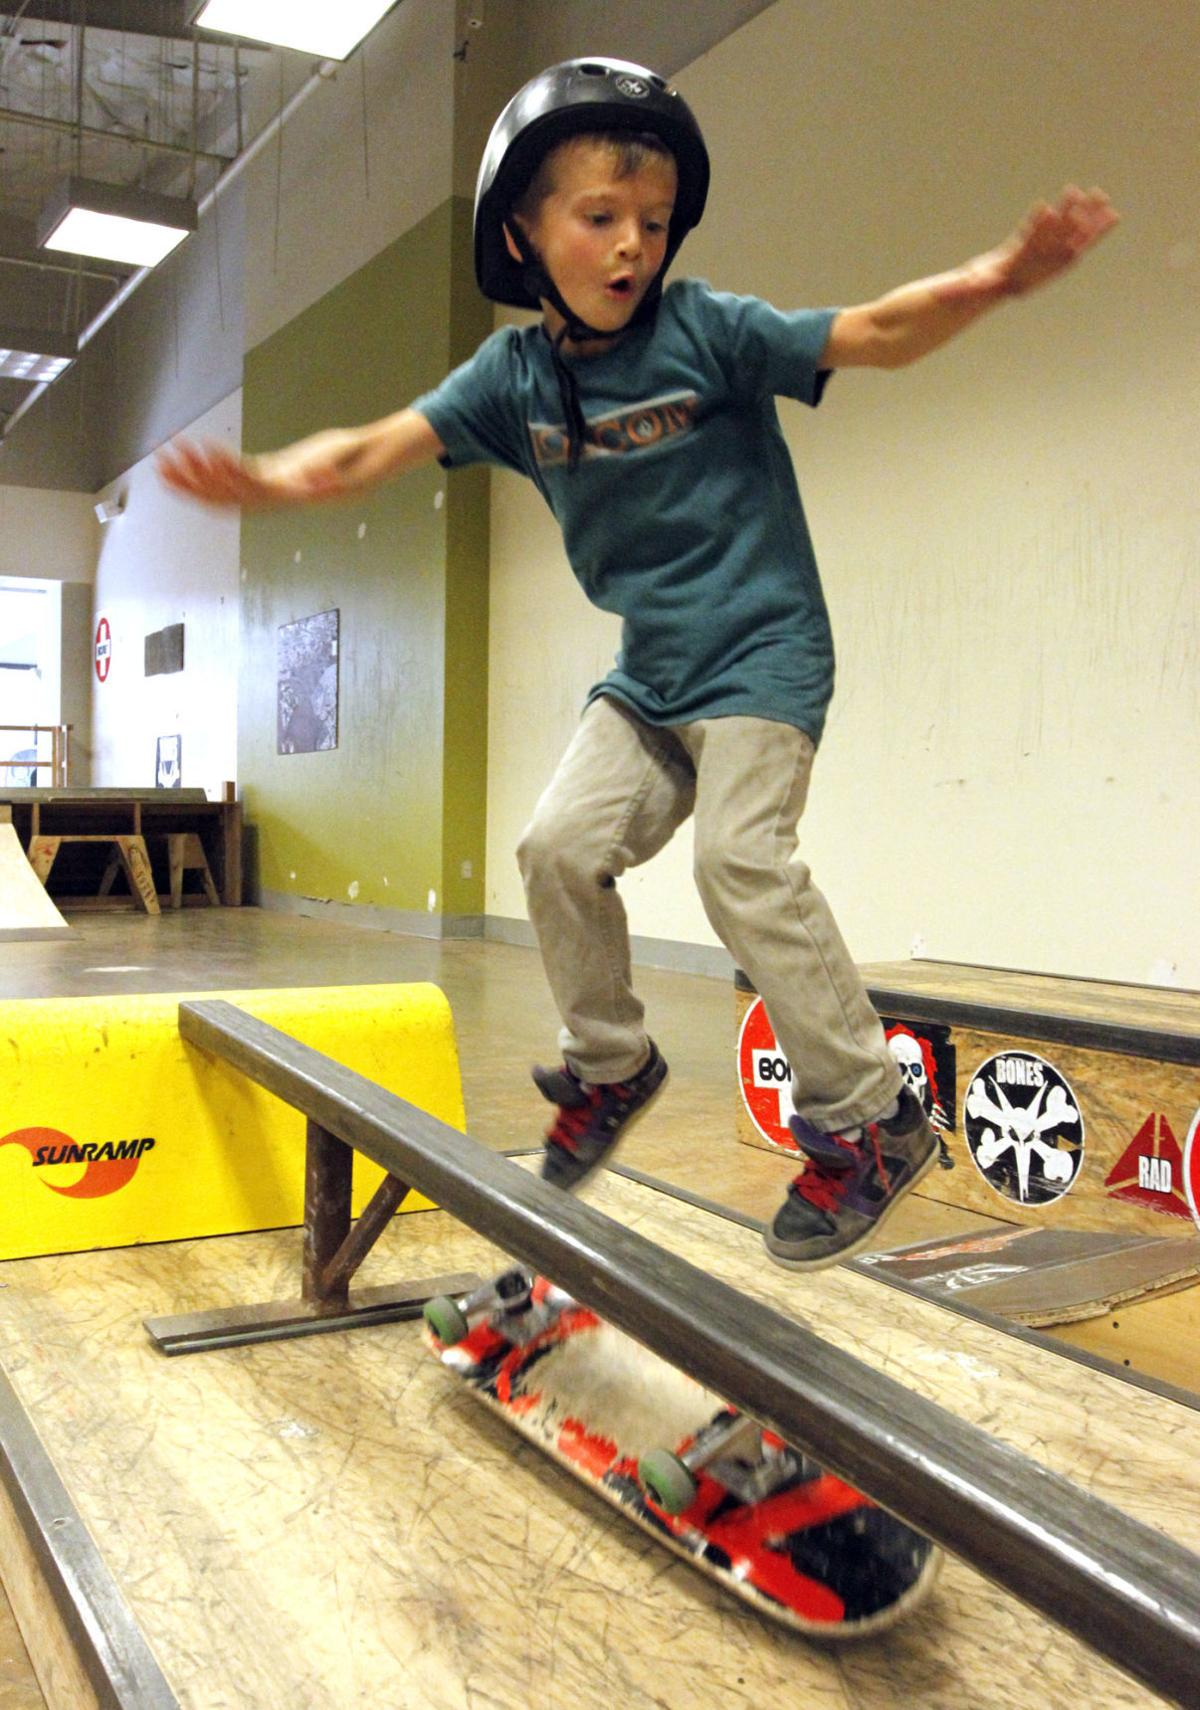 041012 OneWay Skate Camp 05.jpg